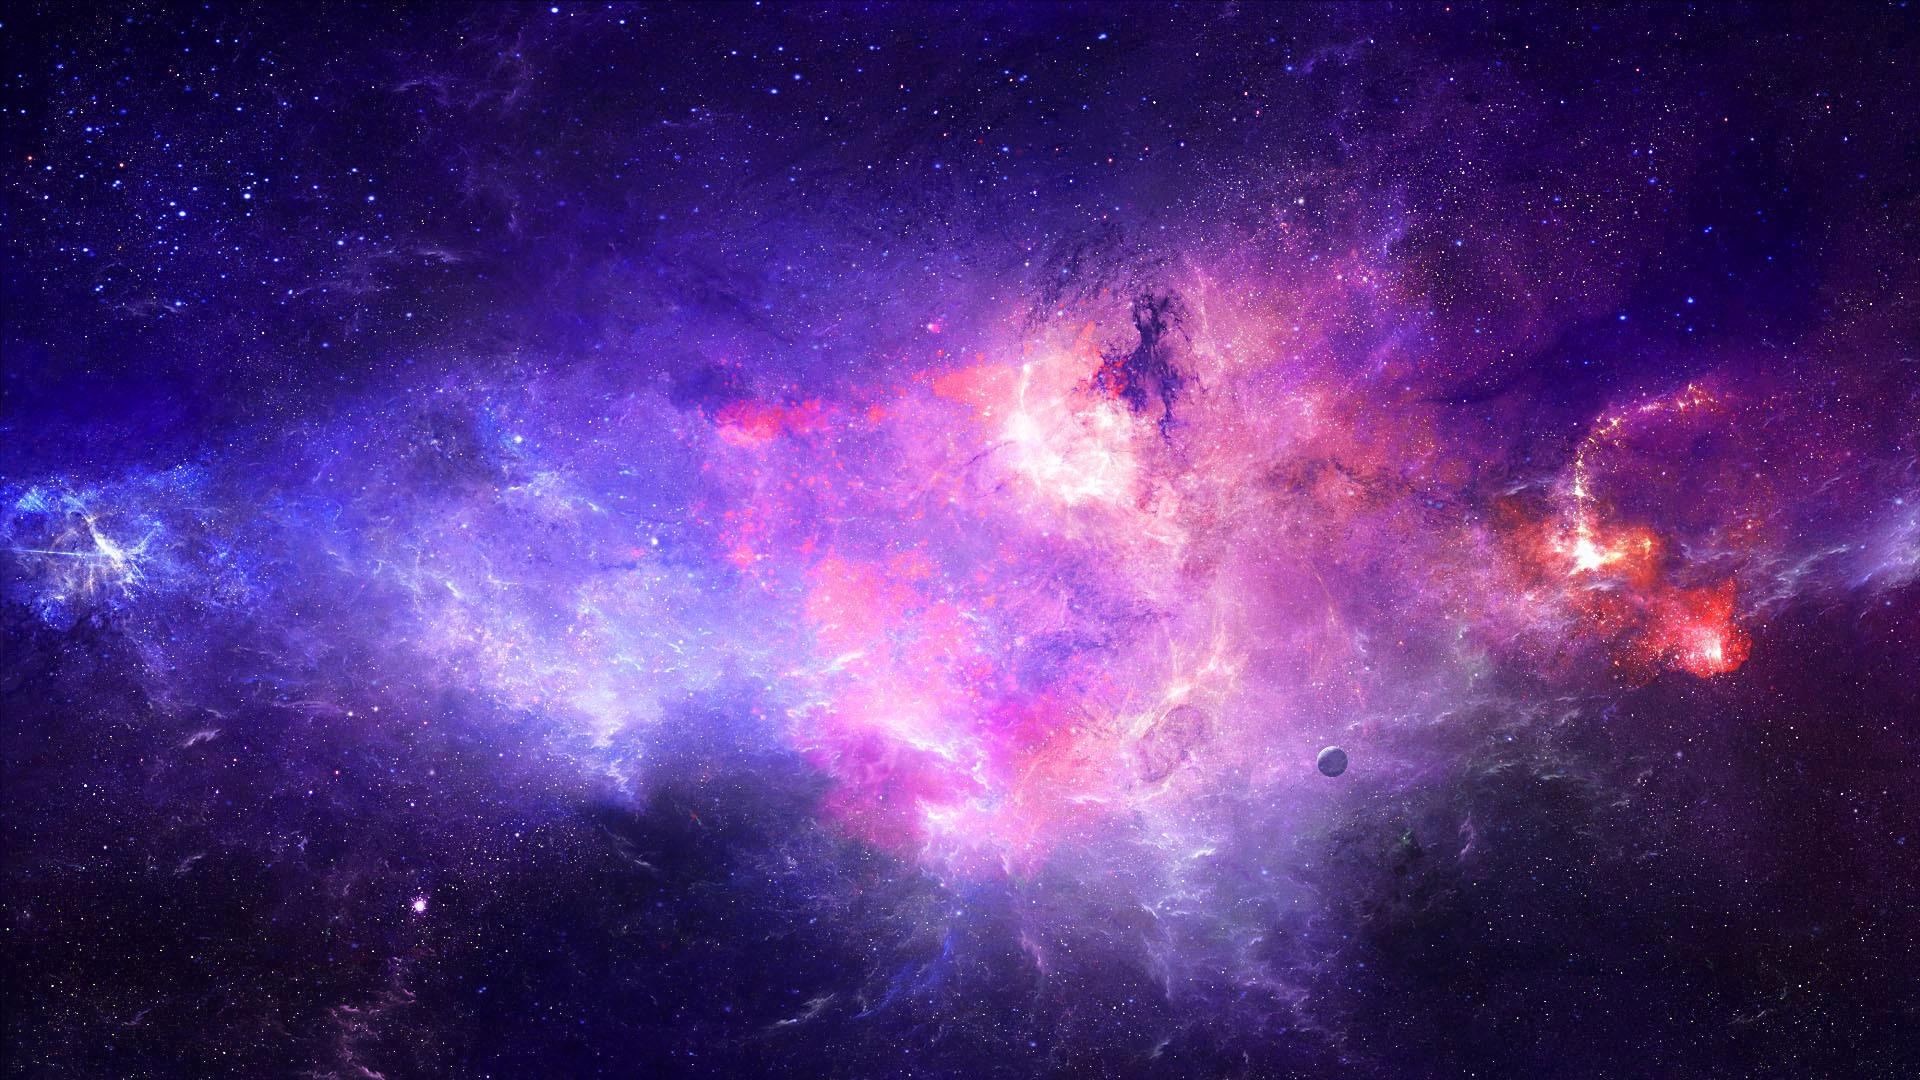 10 Latest 1080p Hd Space Wallpapers Full Hd 1080p For Pc: Обои планета, космос, туманность, Арт, звезды для рабочего